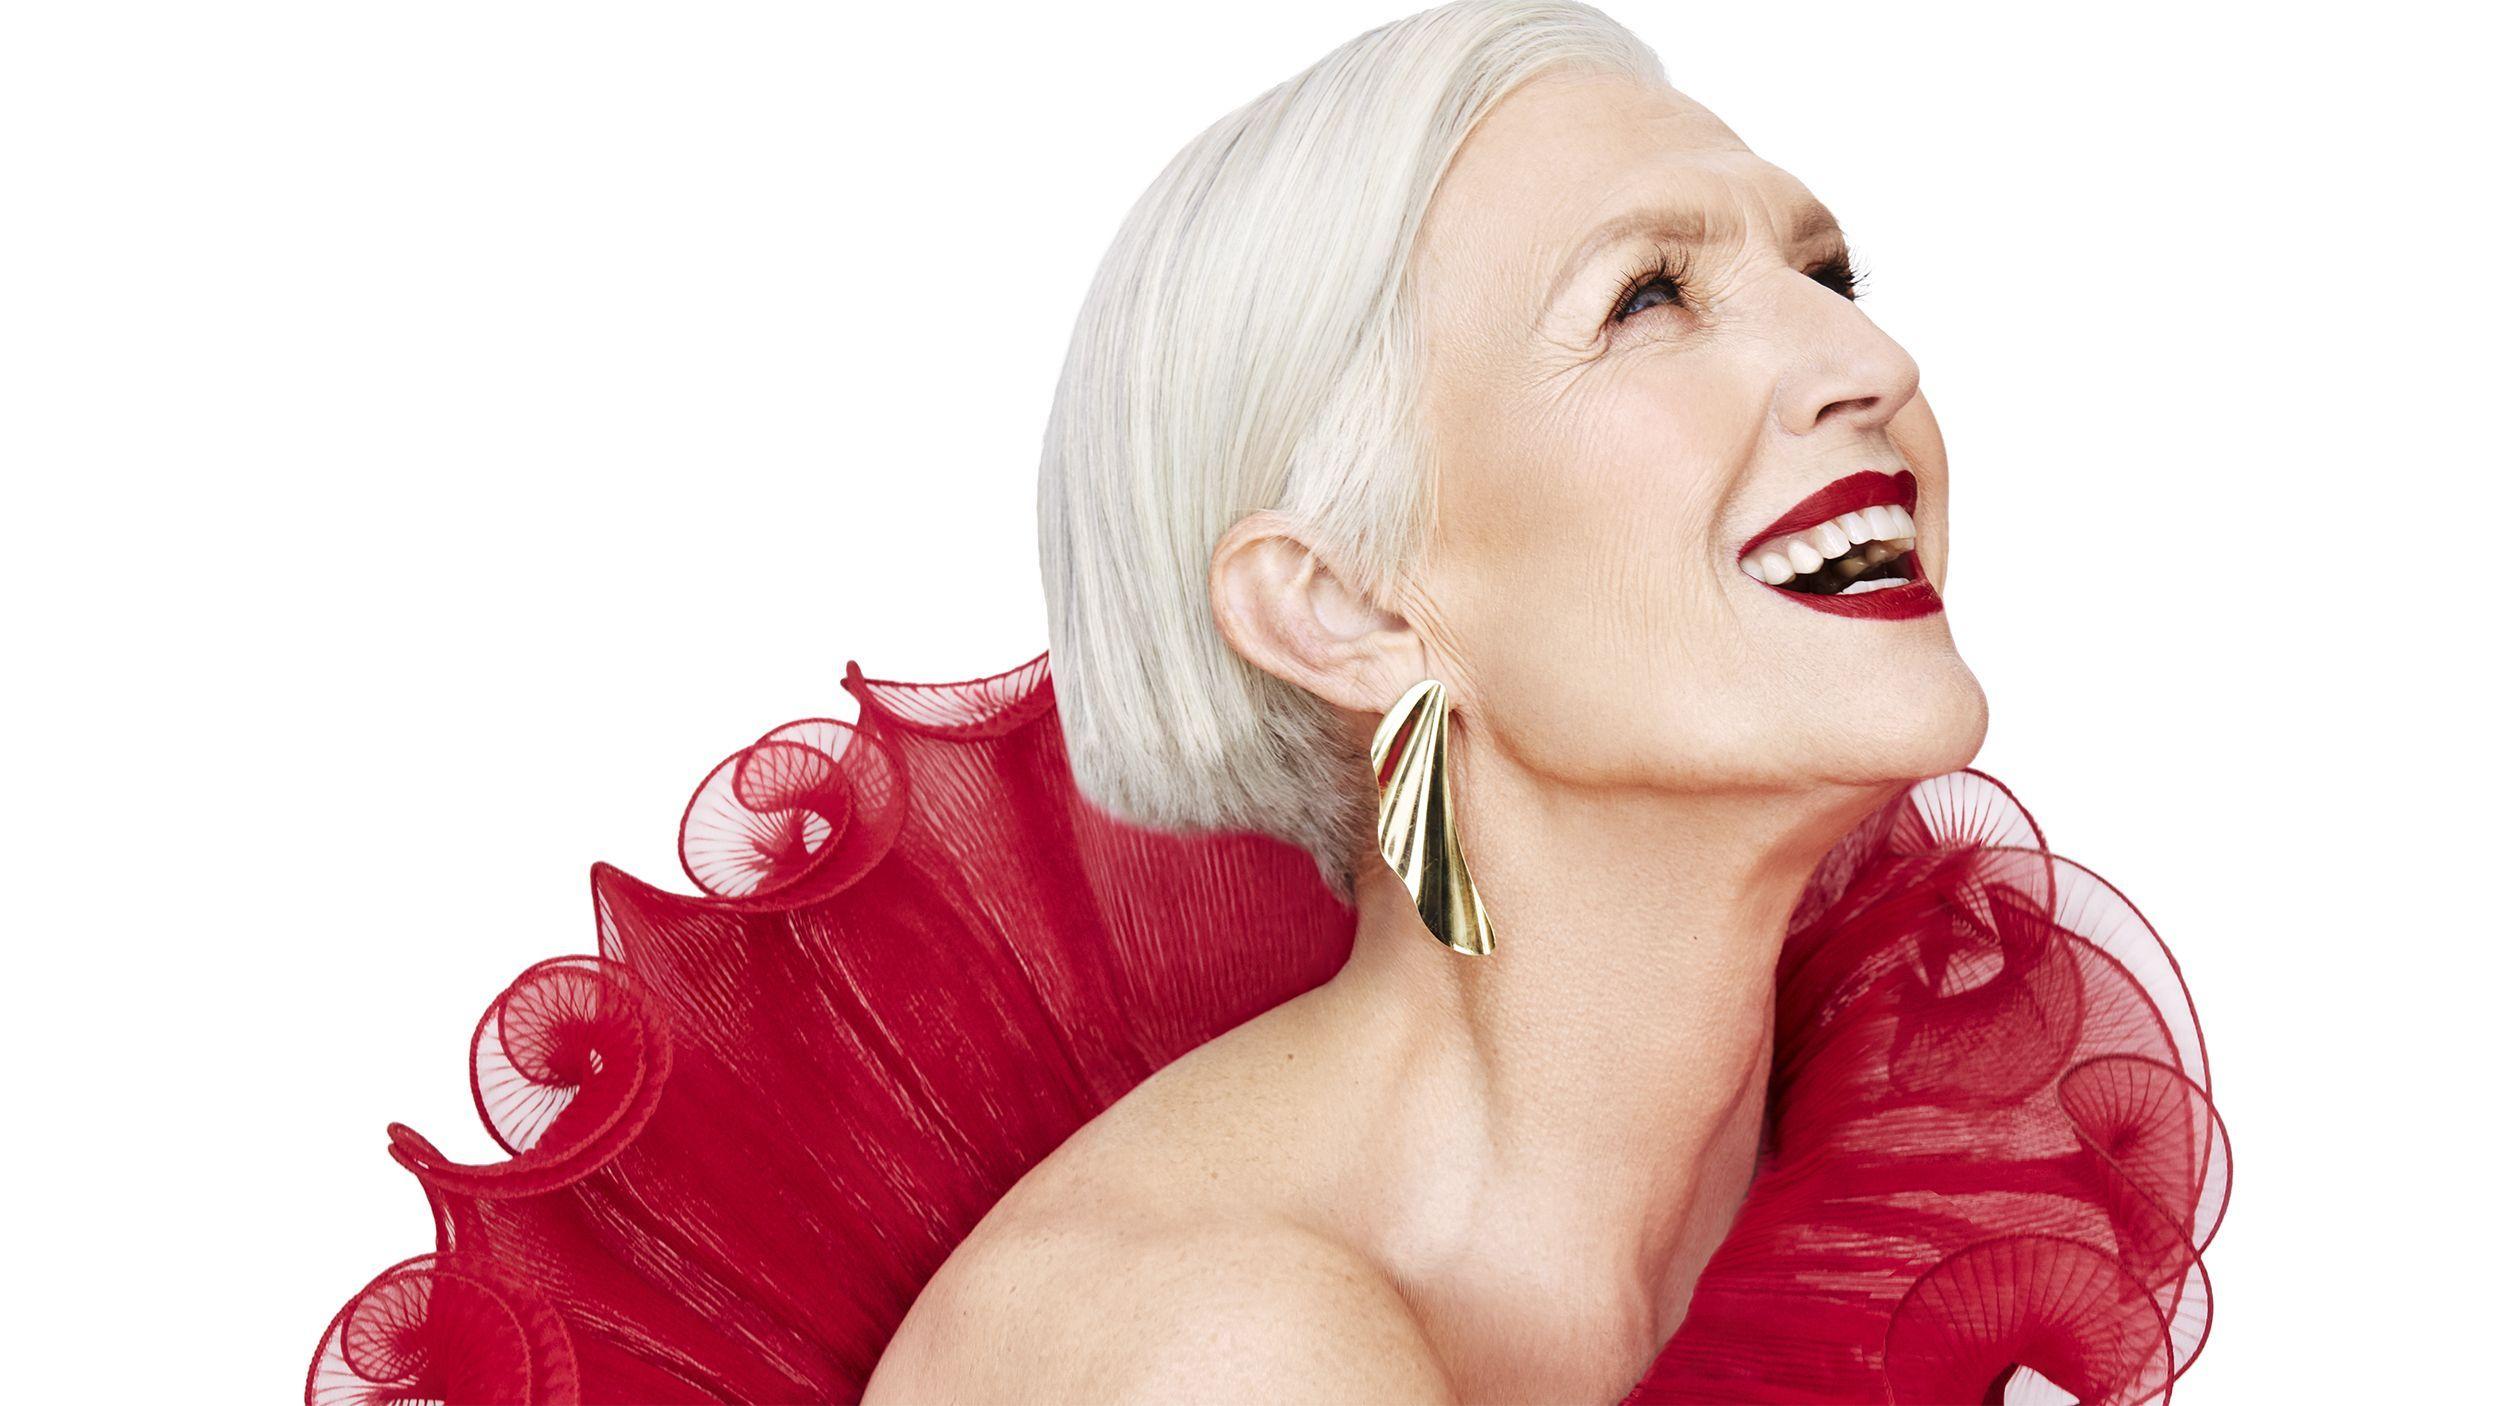 8 of the Most Stylish Ageless Women - Stylish Older Women